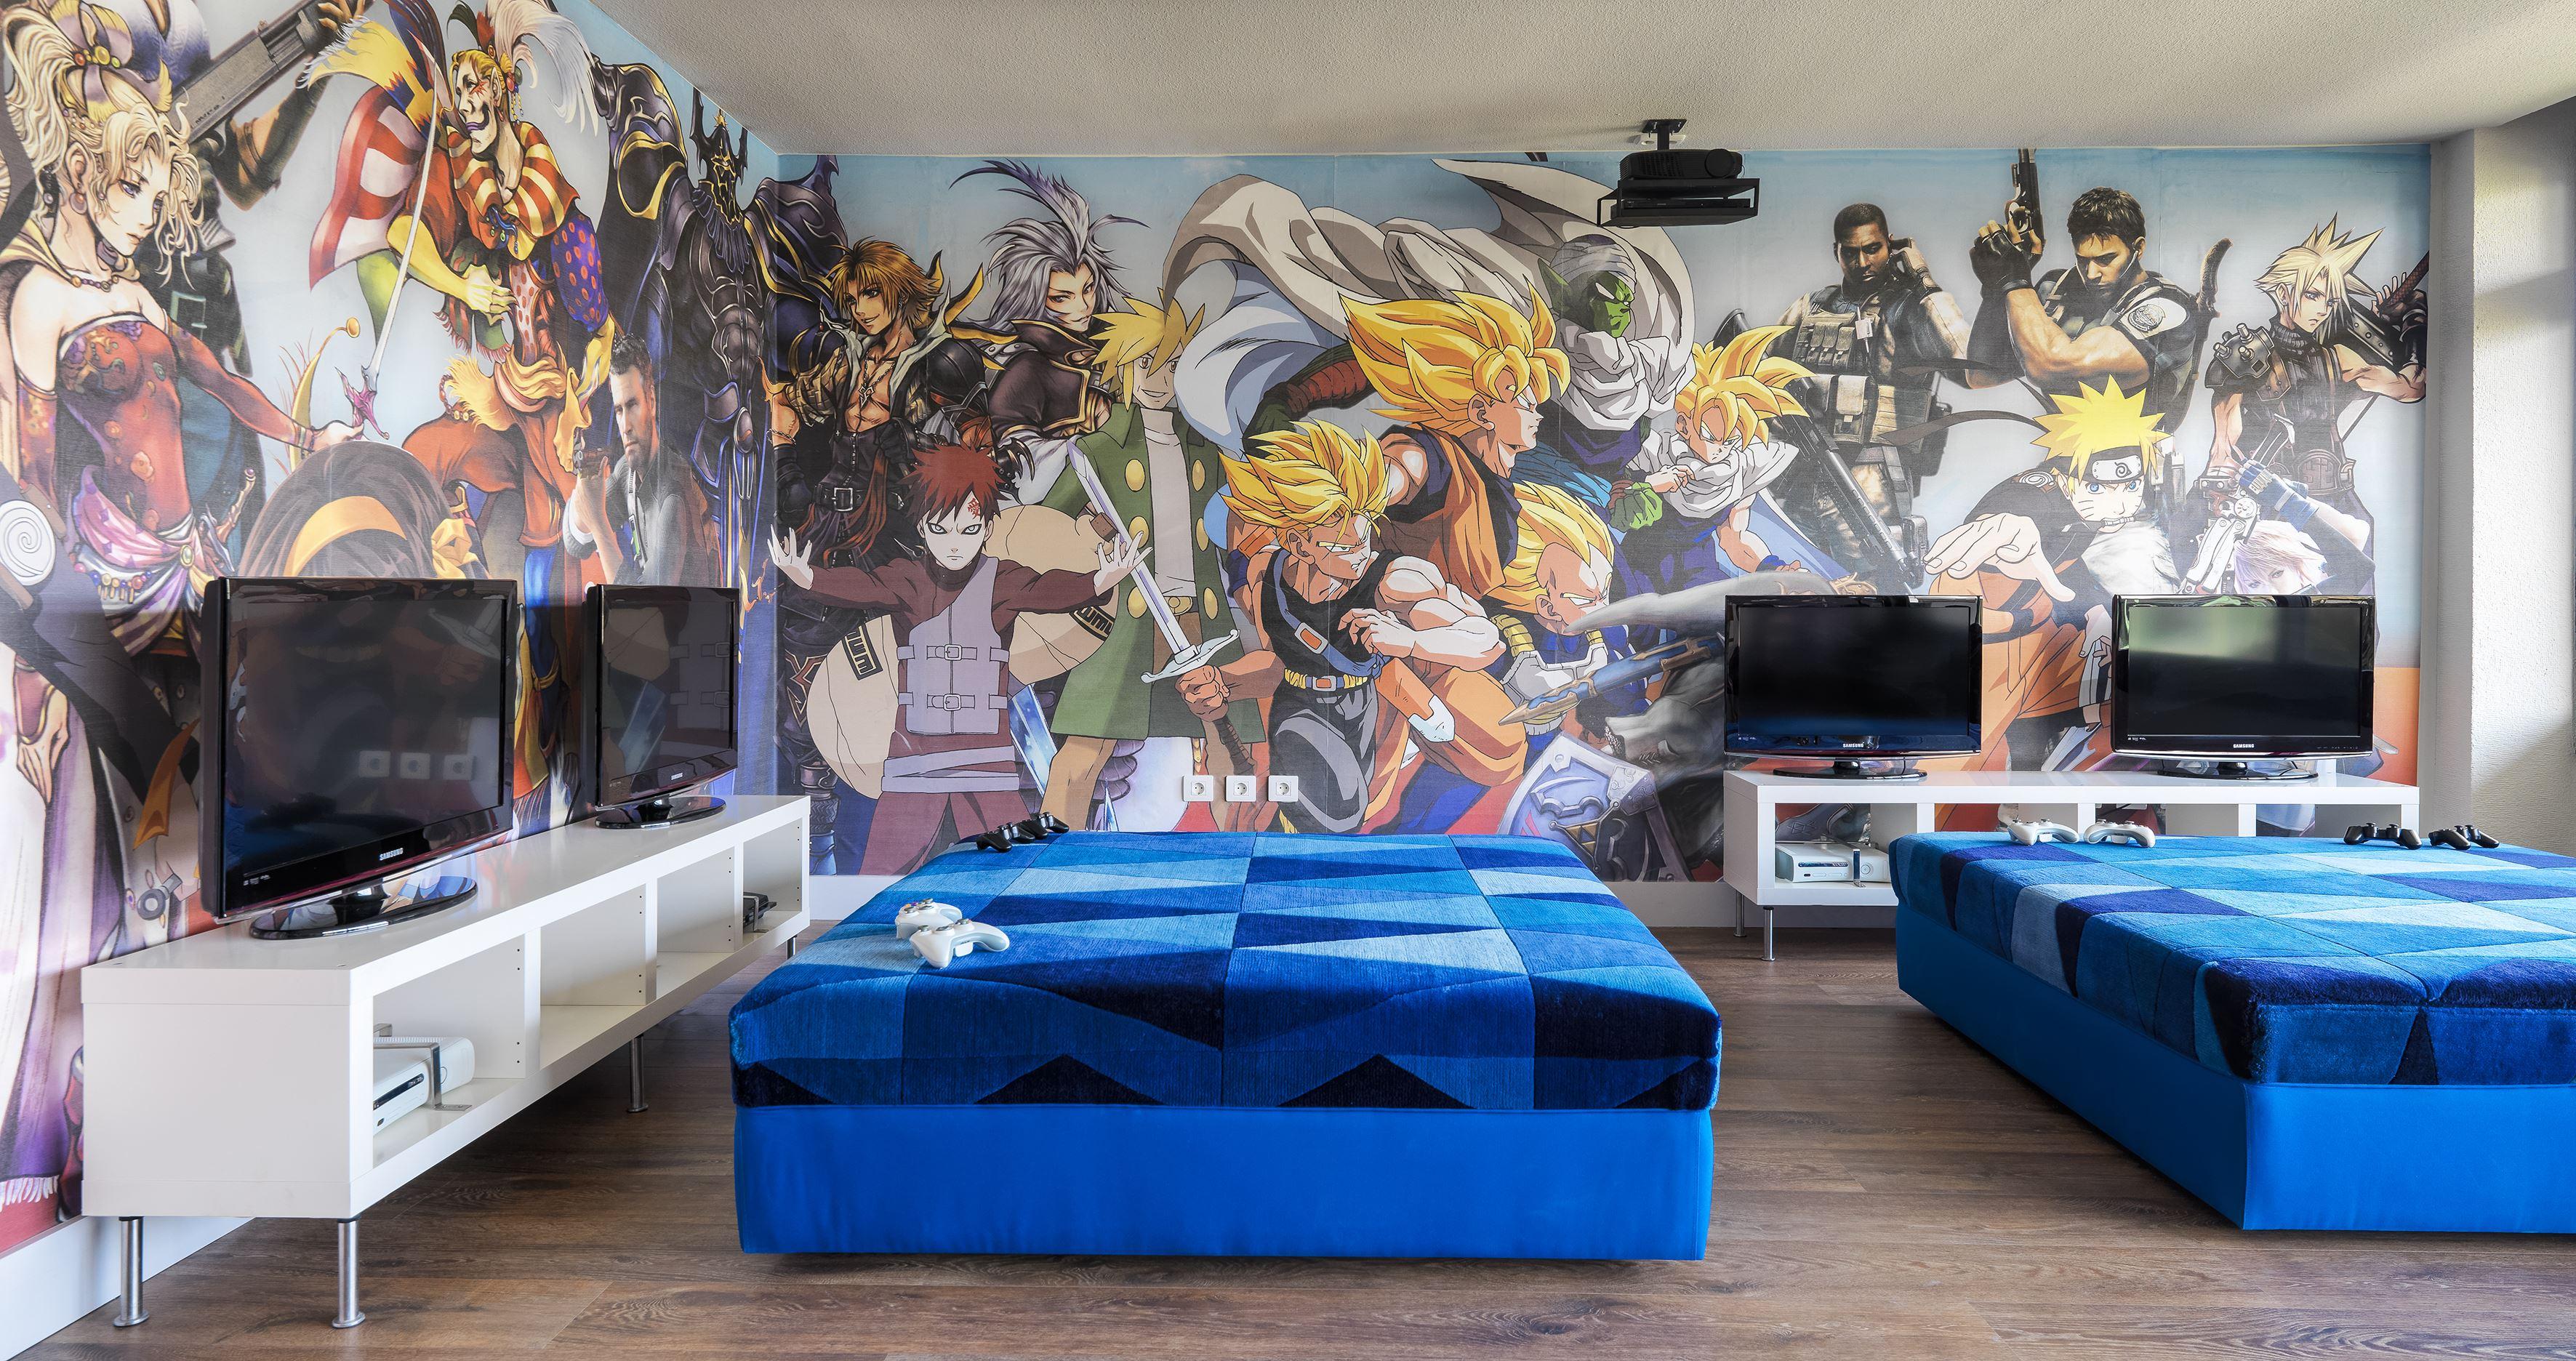 Tv-spelsrum på Hotell H10 Lanzarote Princess, Playa Blanca Lanzarote